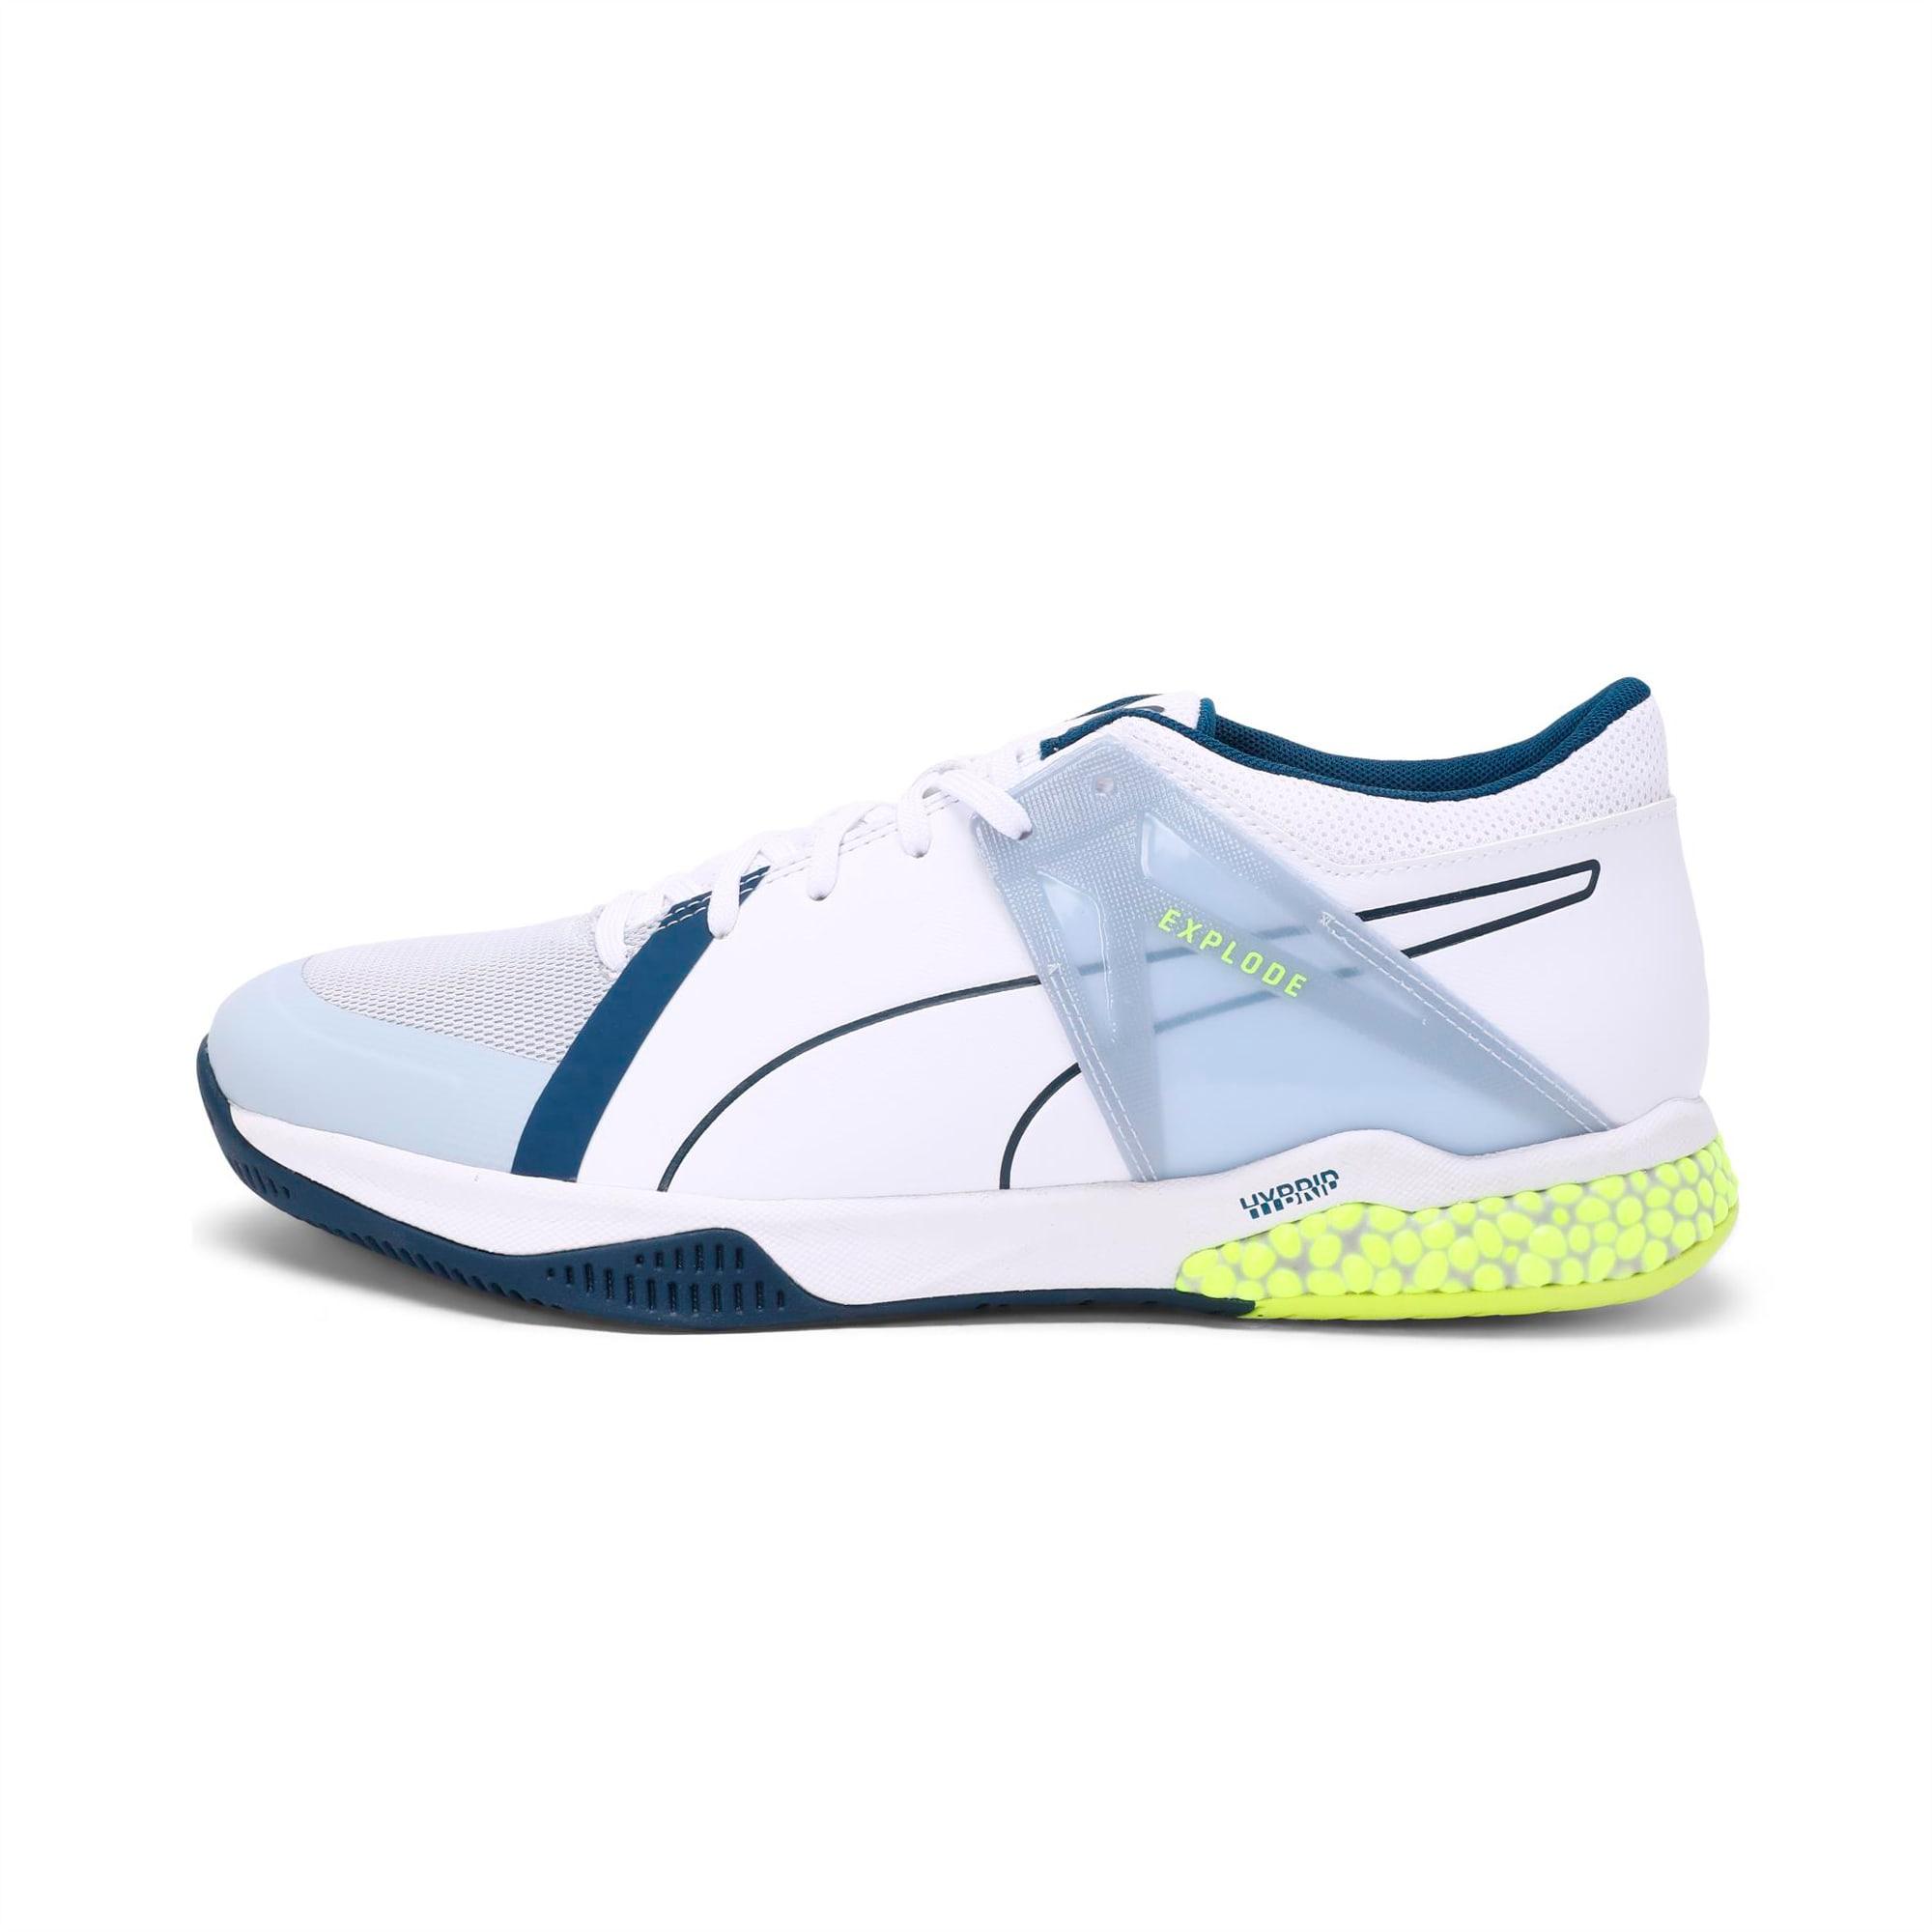 Explode XT Hybrid 2 Handball Shoes